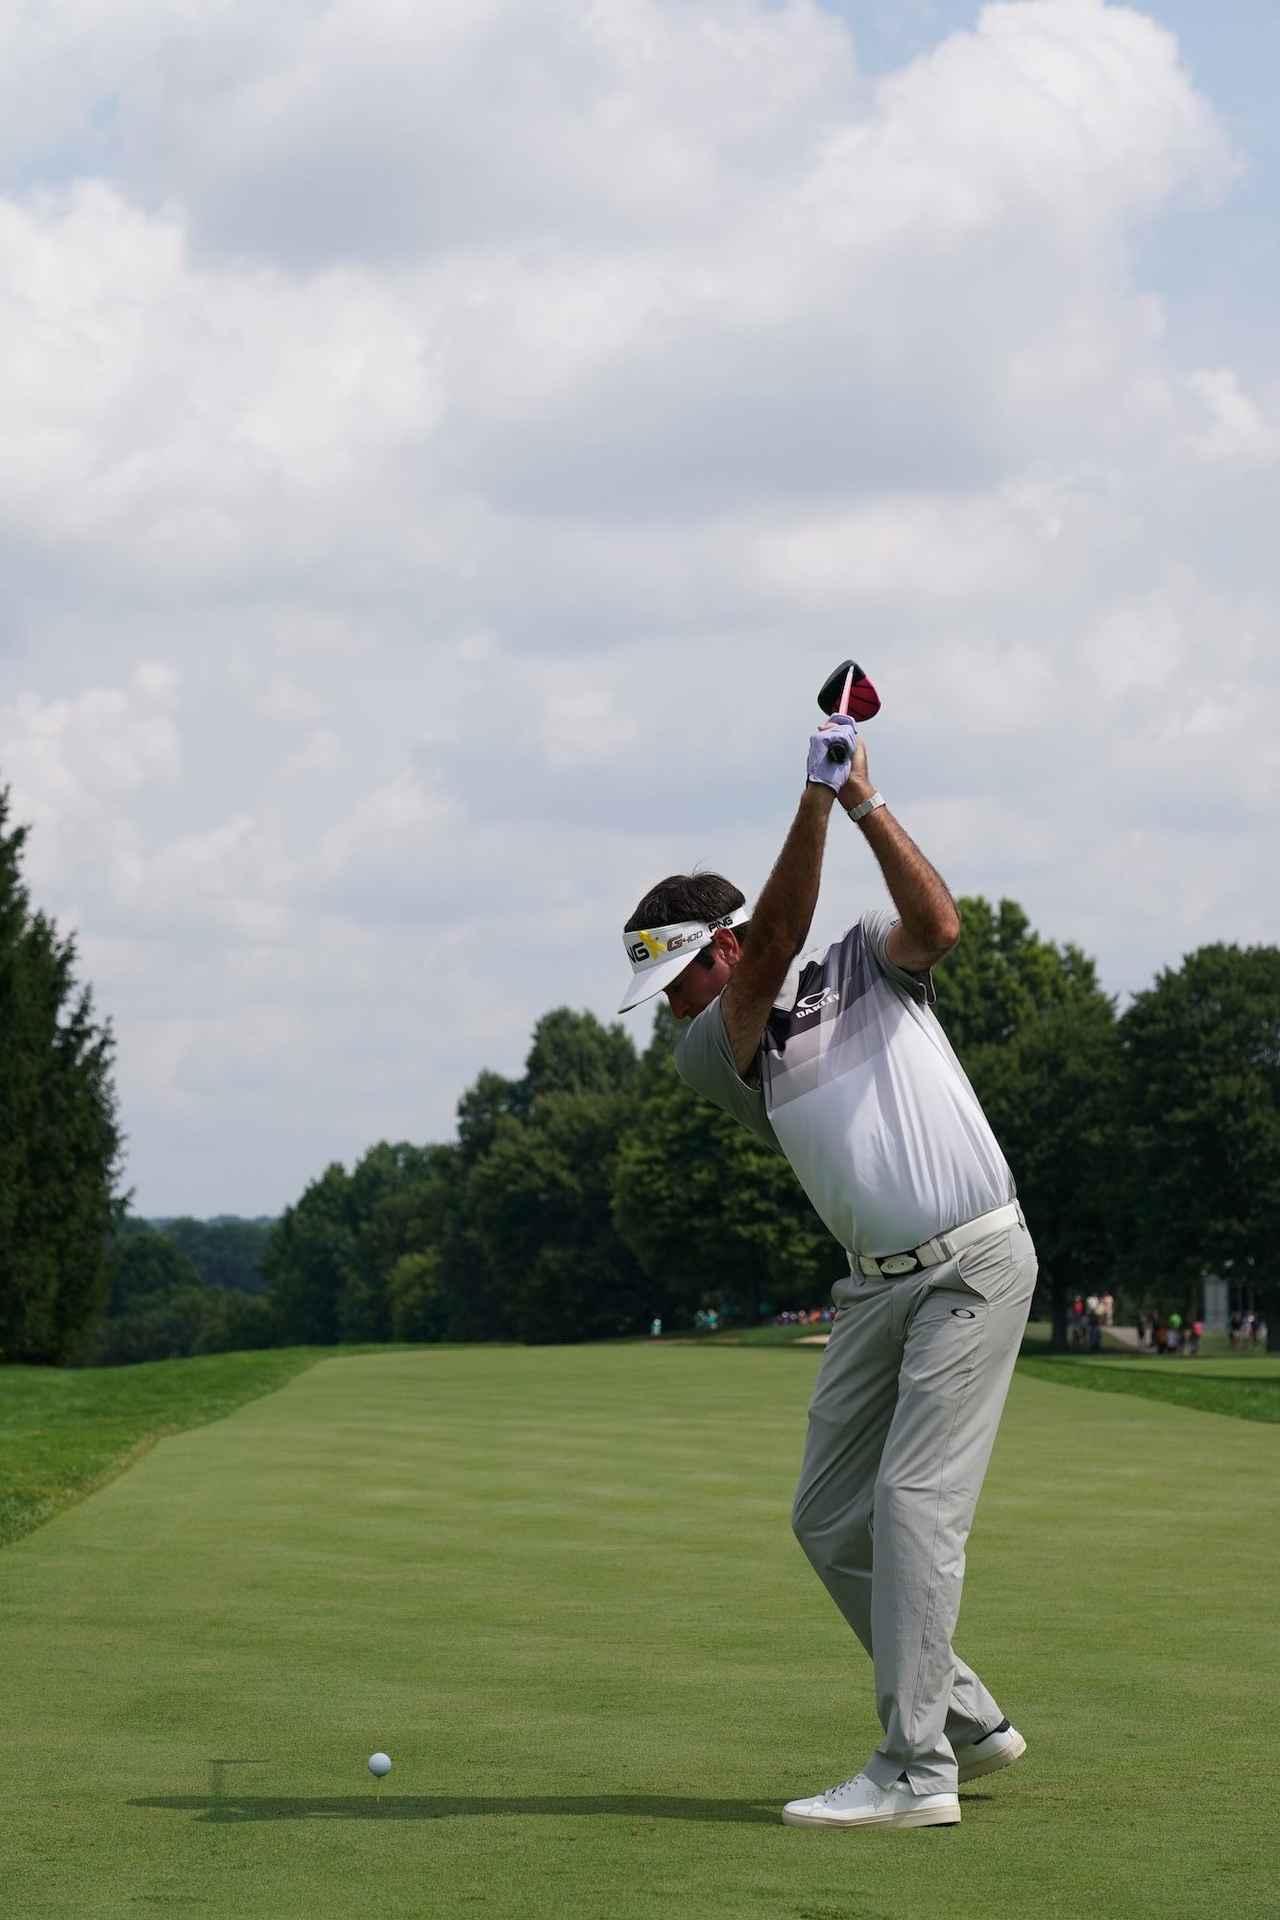 Images : 8番目の画像 - 強烈! バッバ・ワトソンのドライバーショット - みんなのゴルフダイジェスト